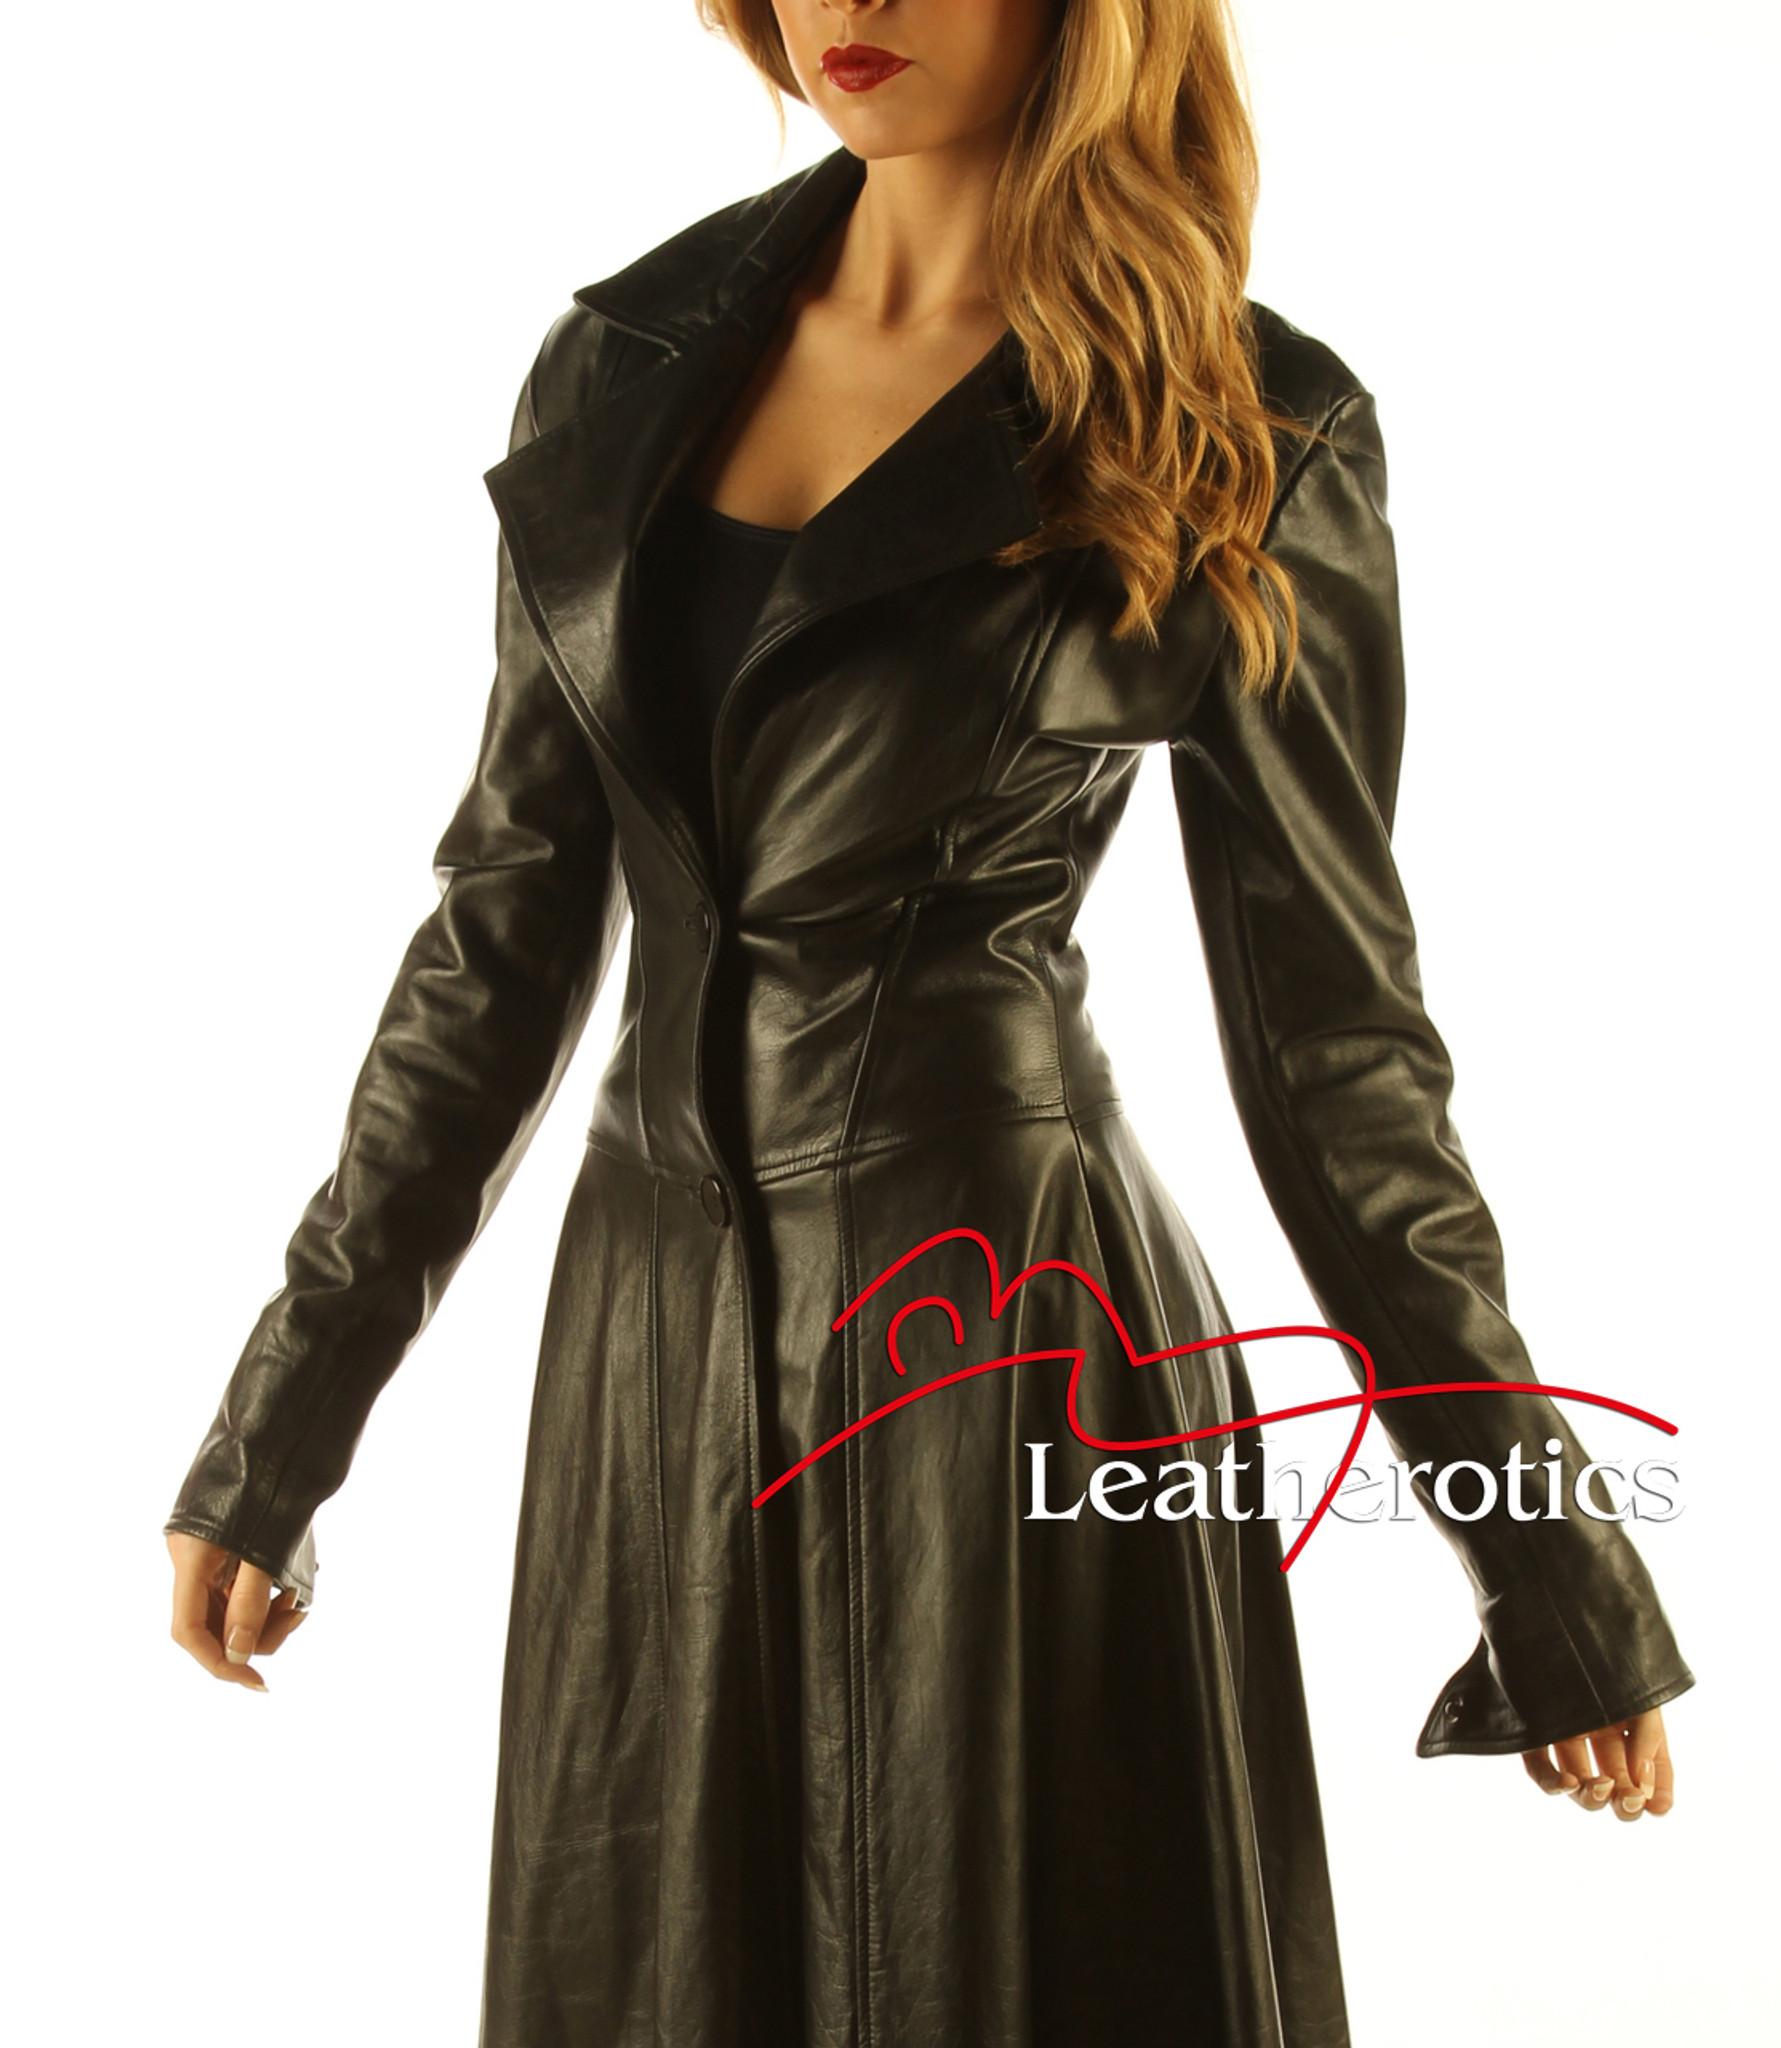 hot-selling fine craftsmanship yet not vulgar Ladies Black Leather Full Length Dress Coat Burlesque Alternative Clothing